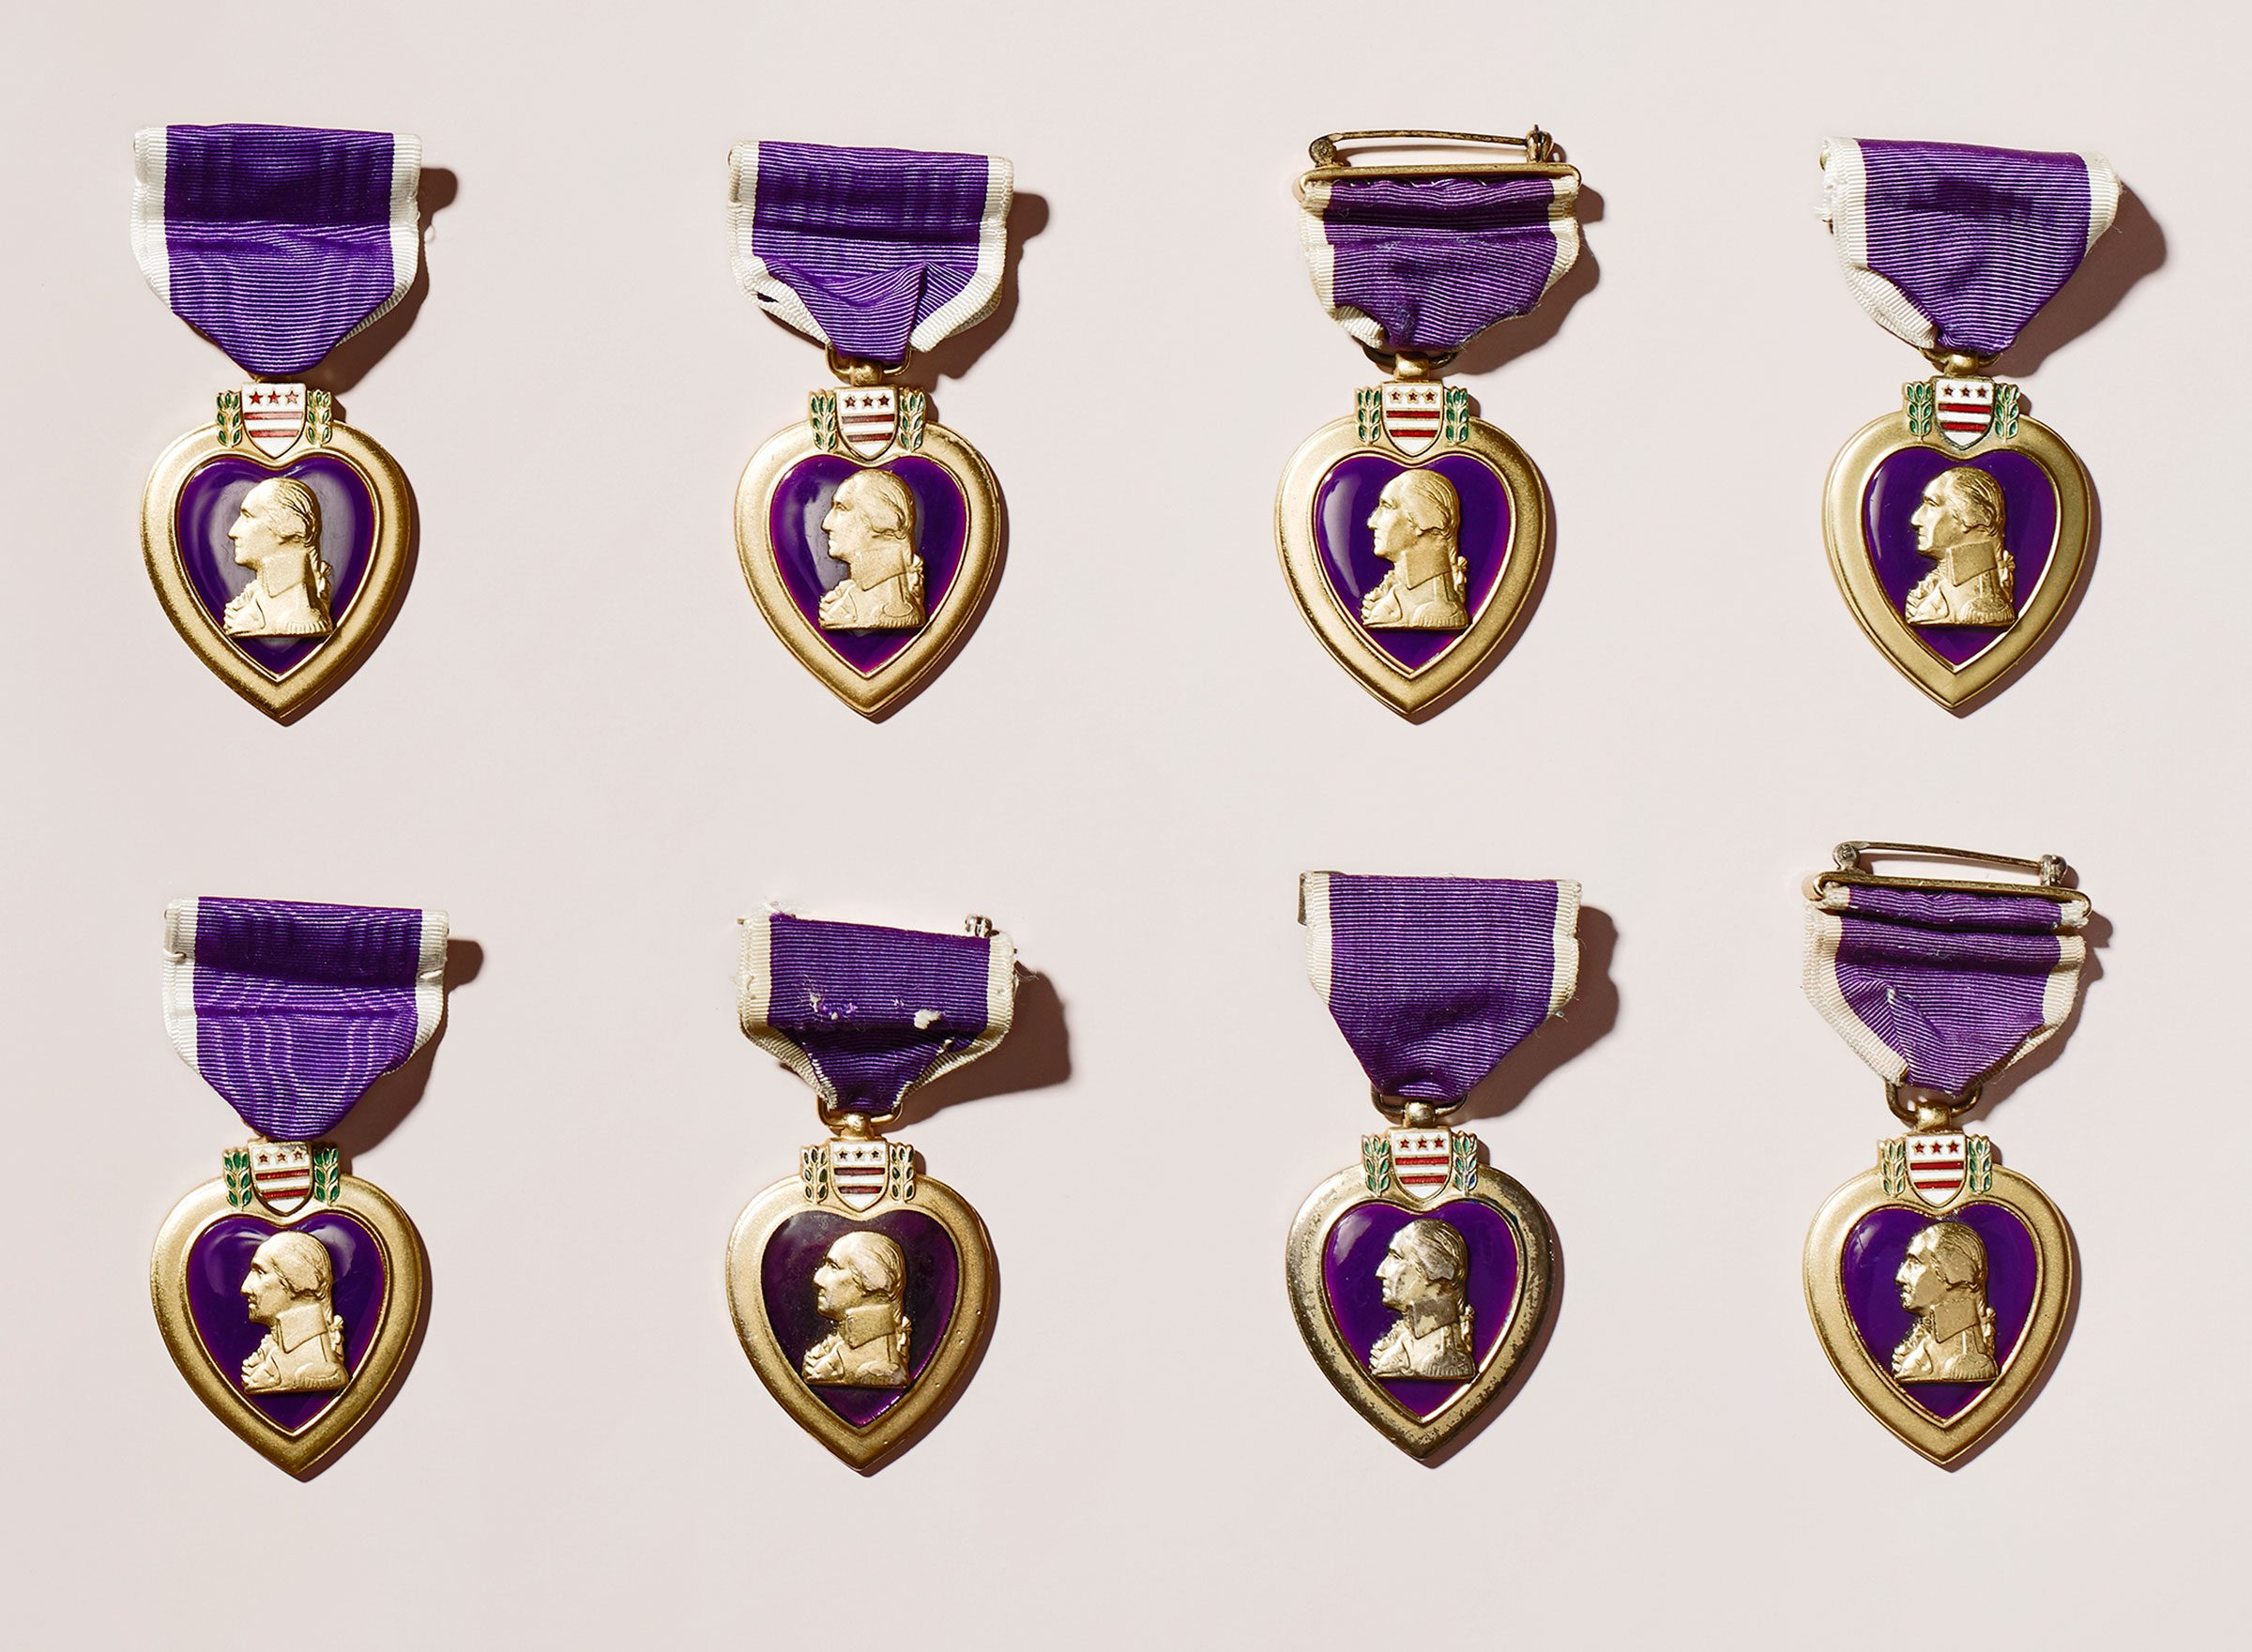 purple heart Find great deals on ebay for purple heart box and purple heart medal shop with confidence.